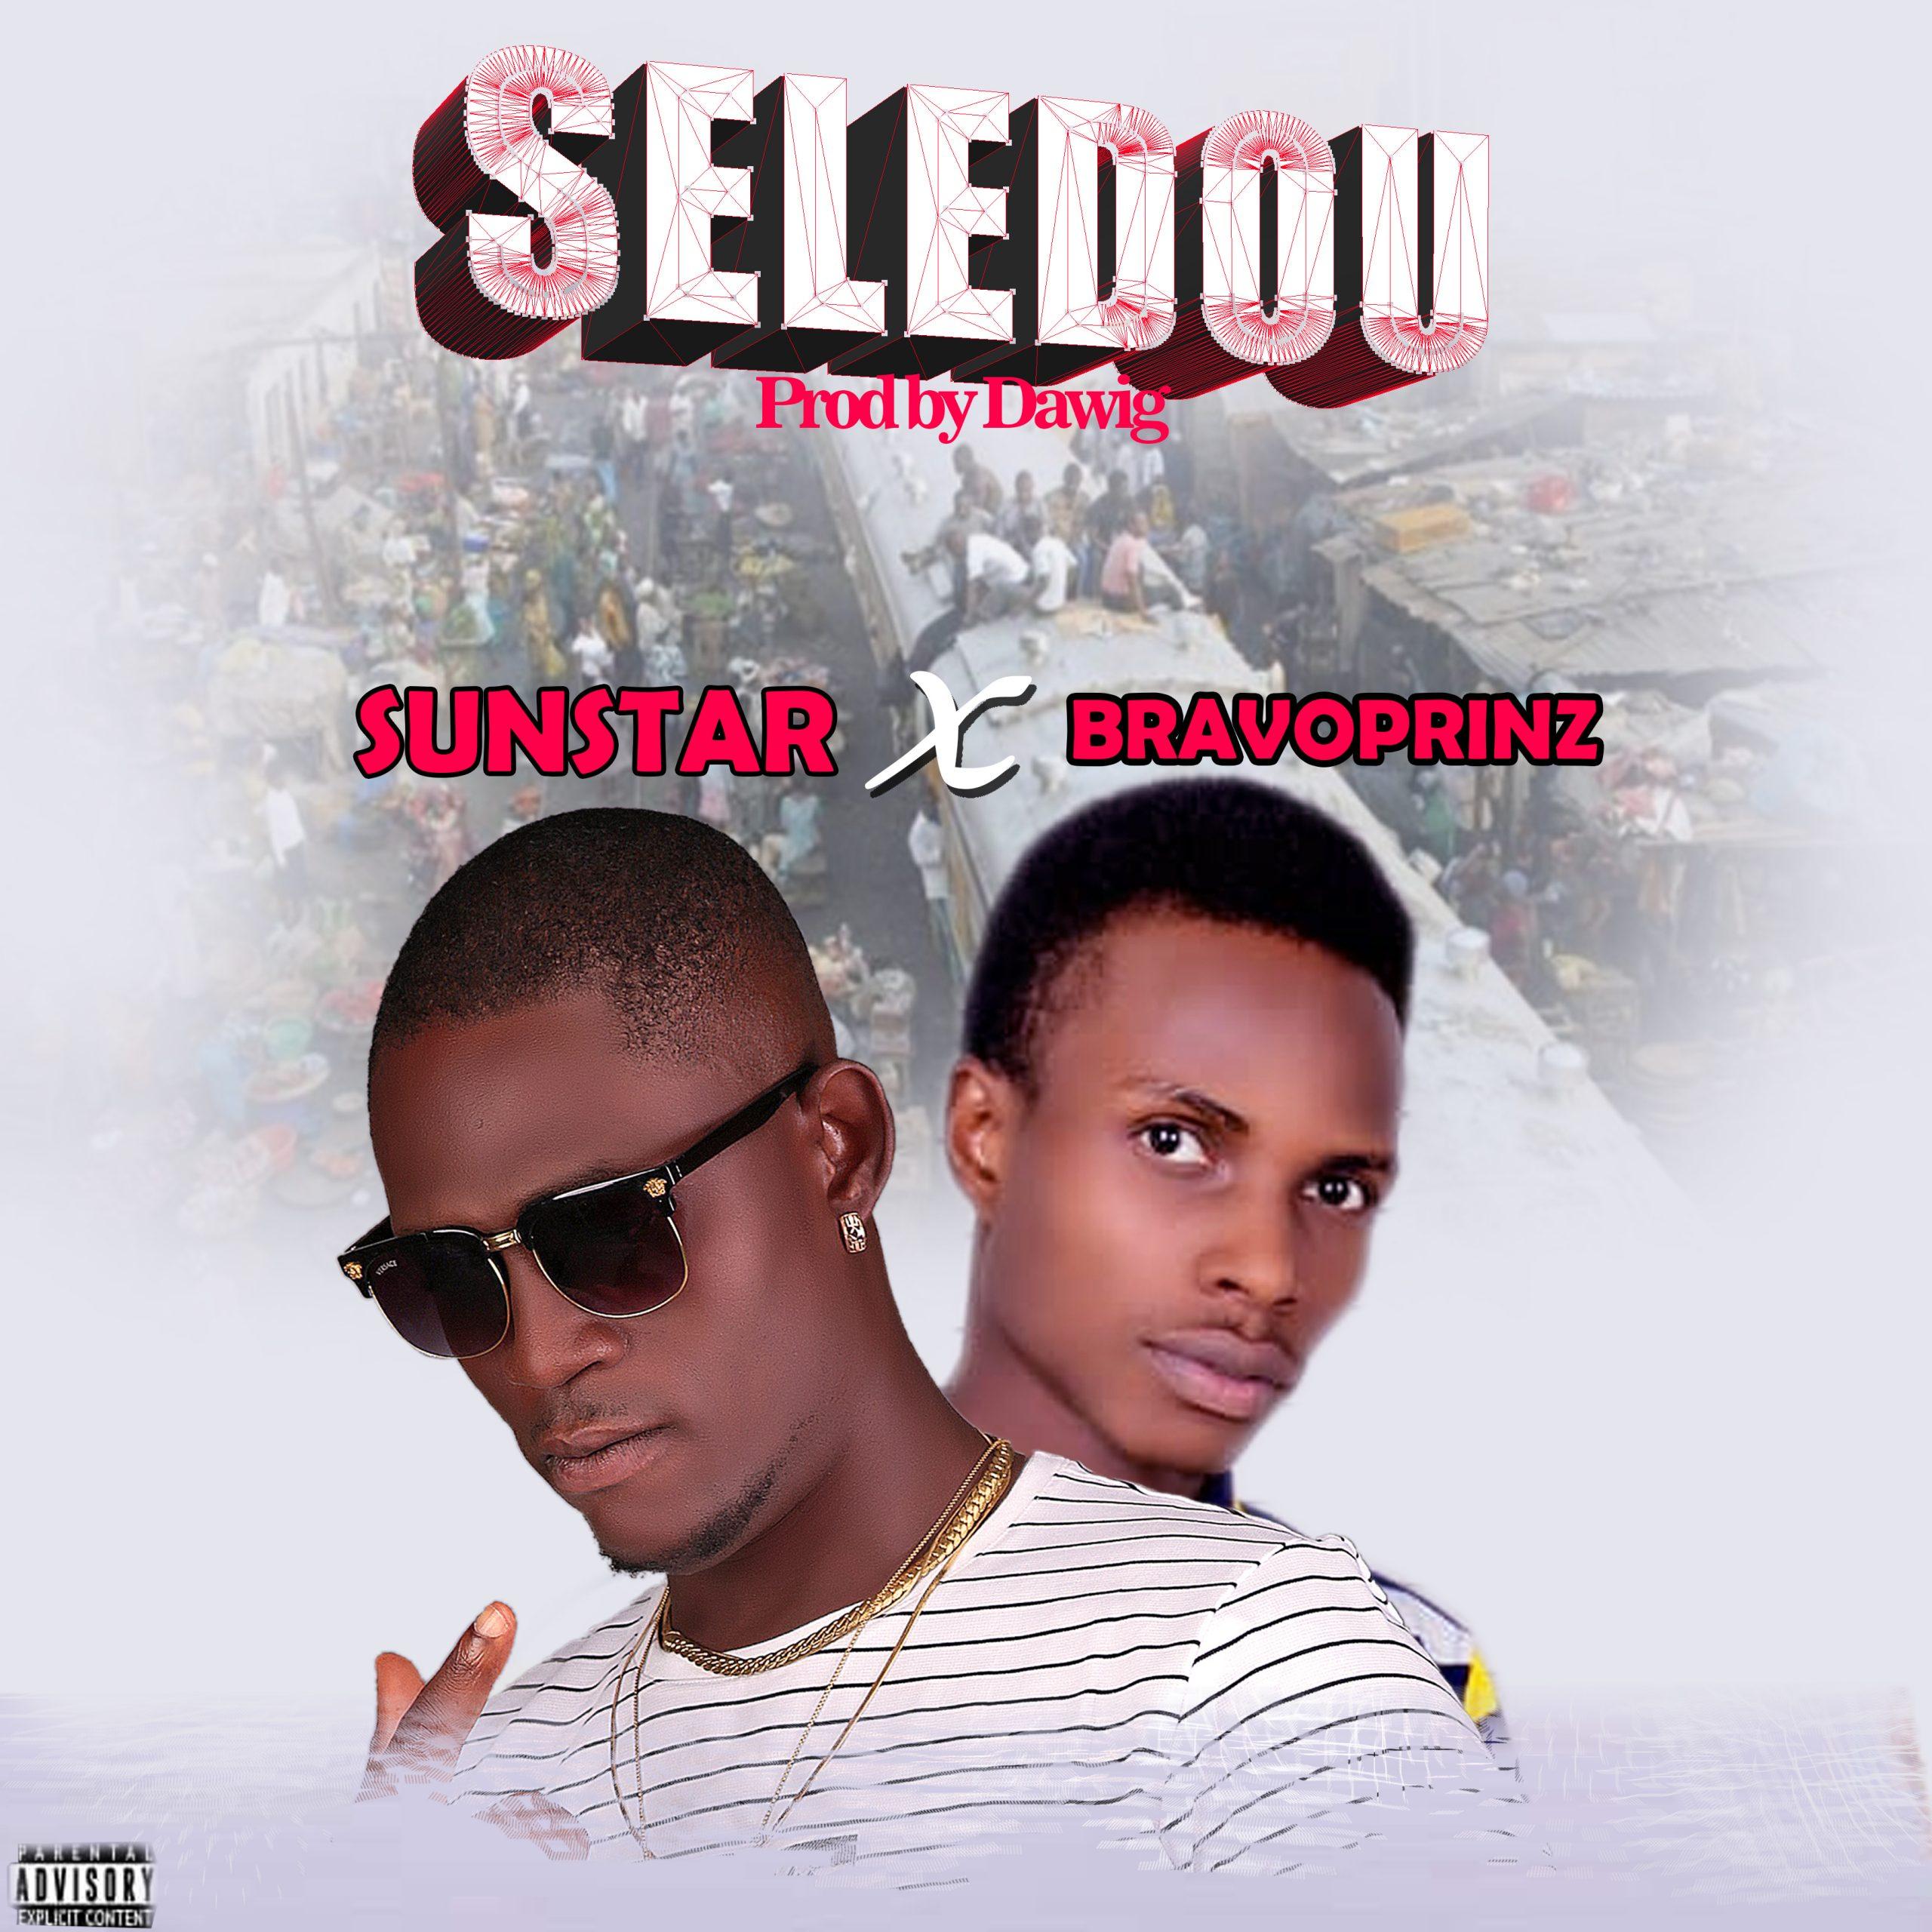 "Sunstar -""Seledou"" Feat. Bravoprinz (Prod. Dawig) 1"